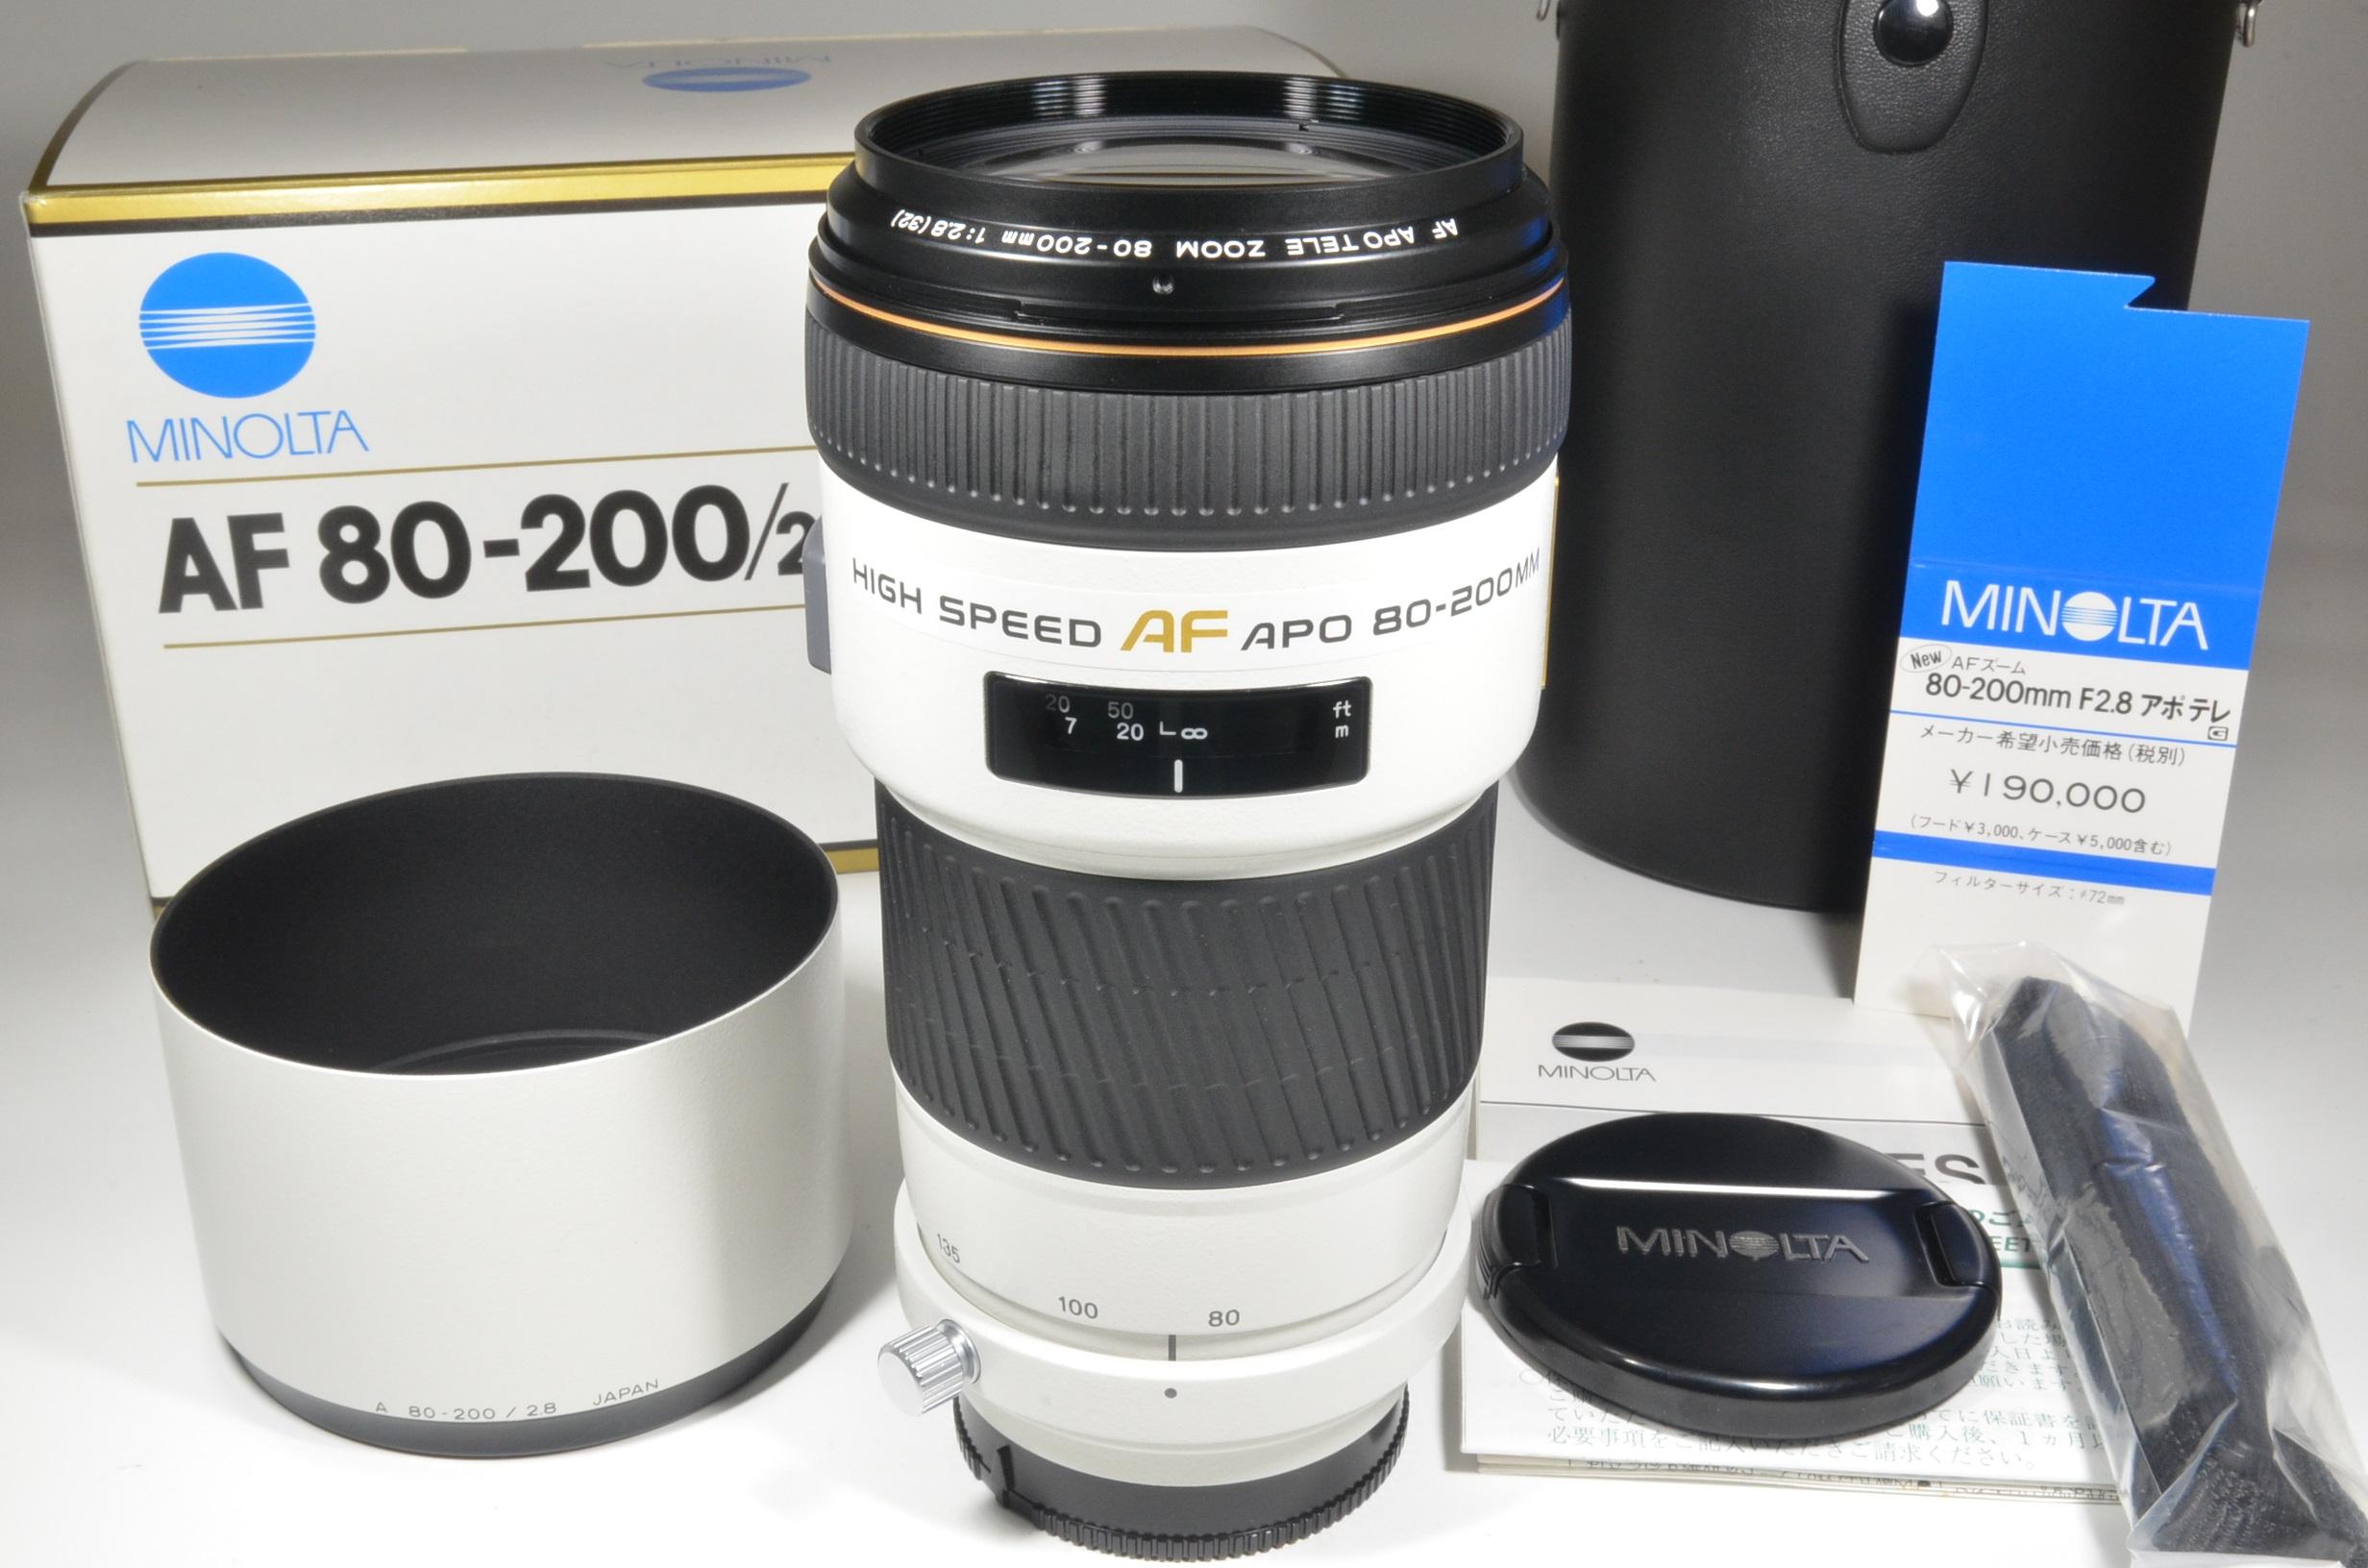 minolta high speed af apo 80-200mm f2.8 g lens sony japan  brand new